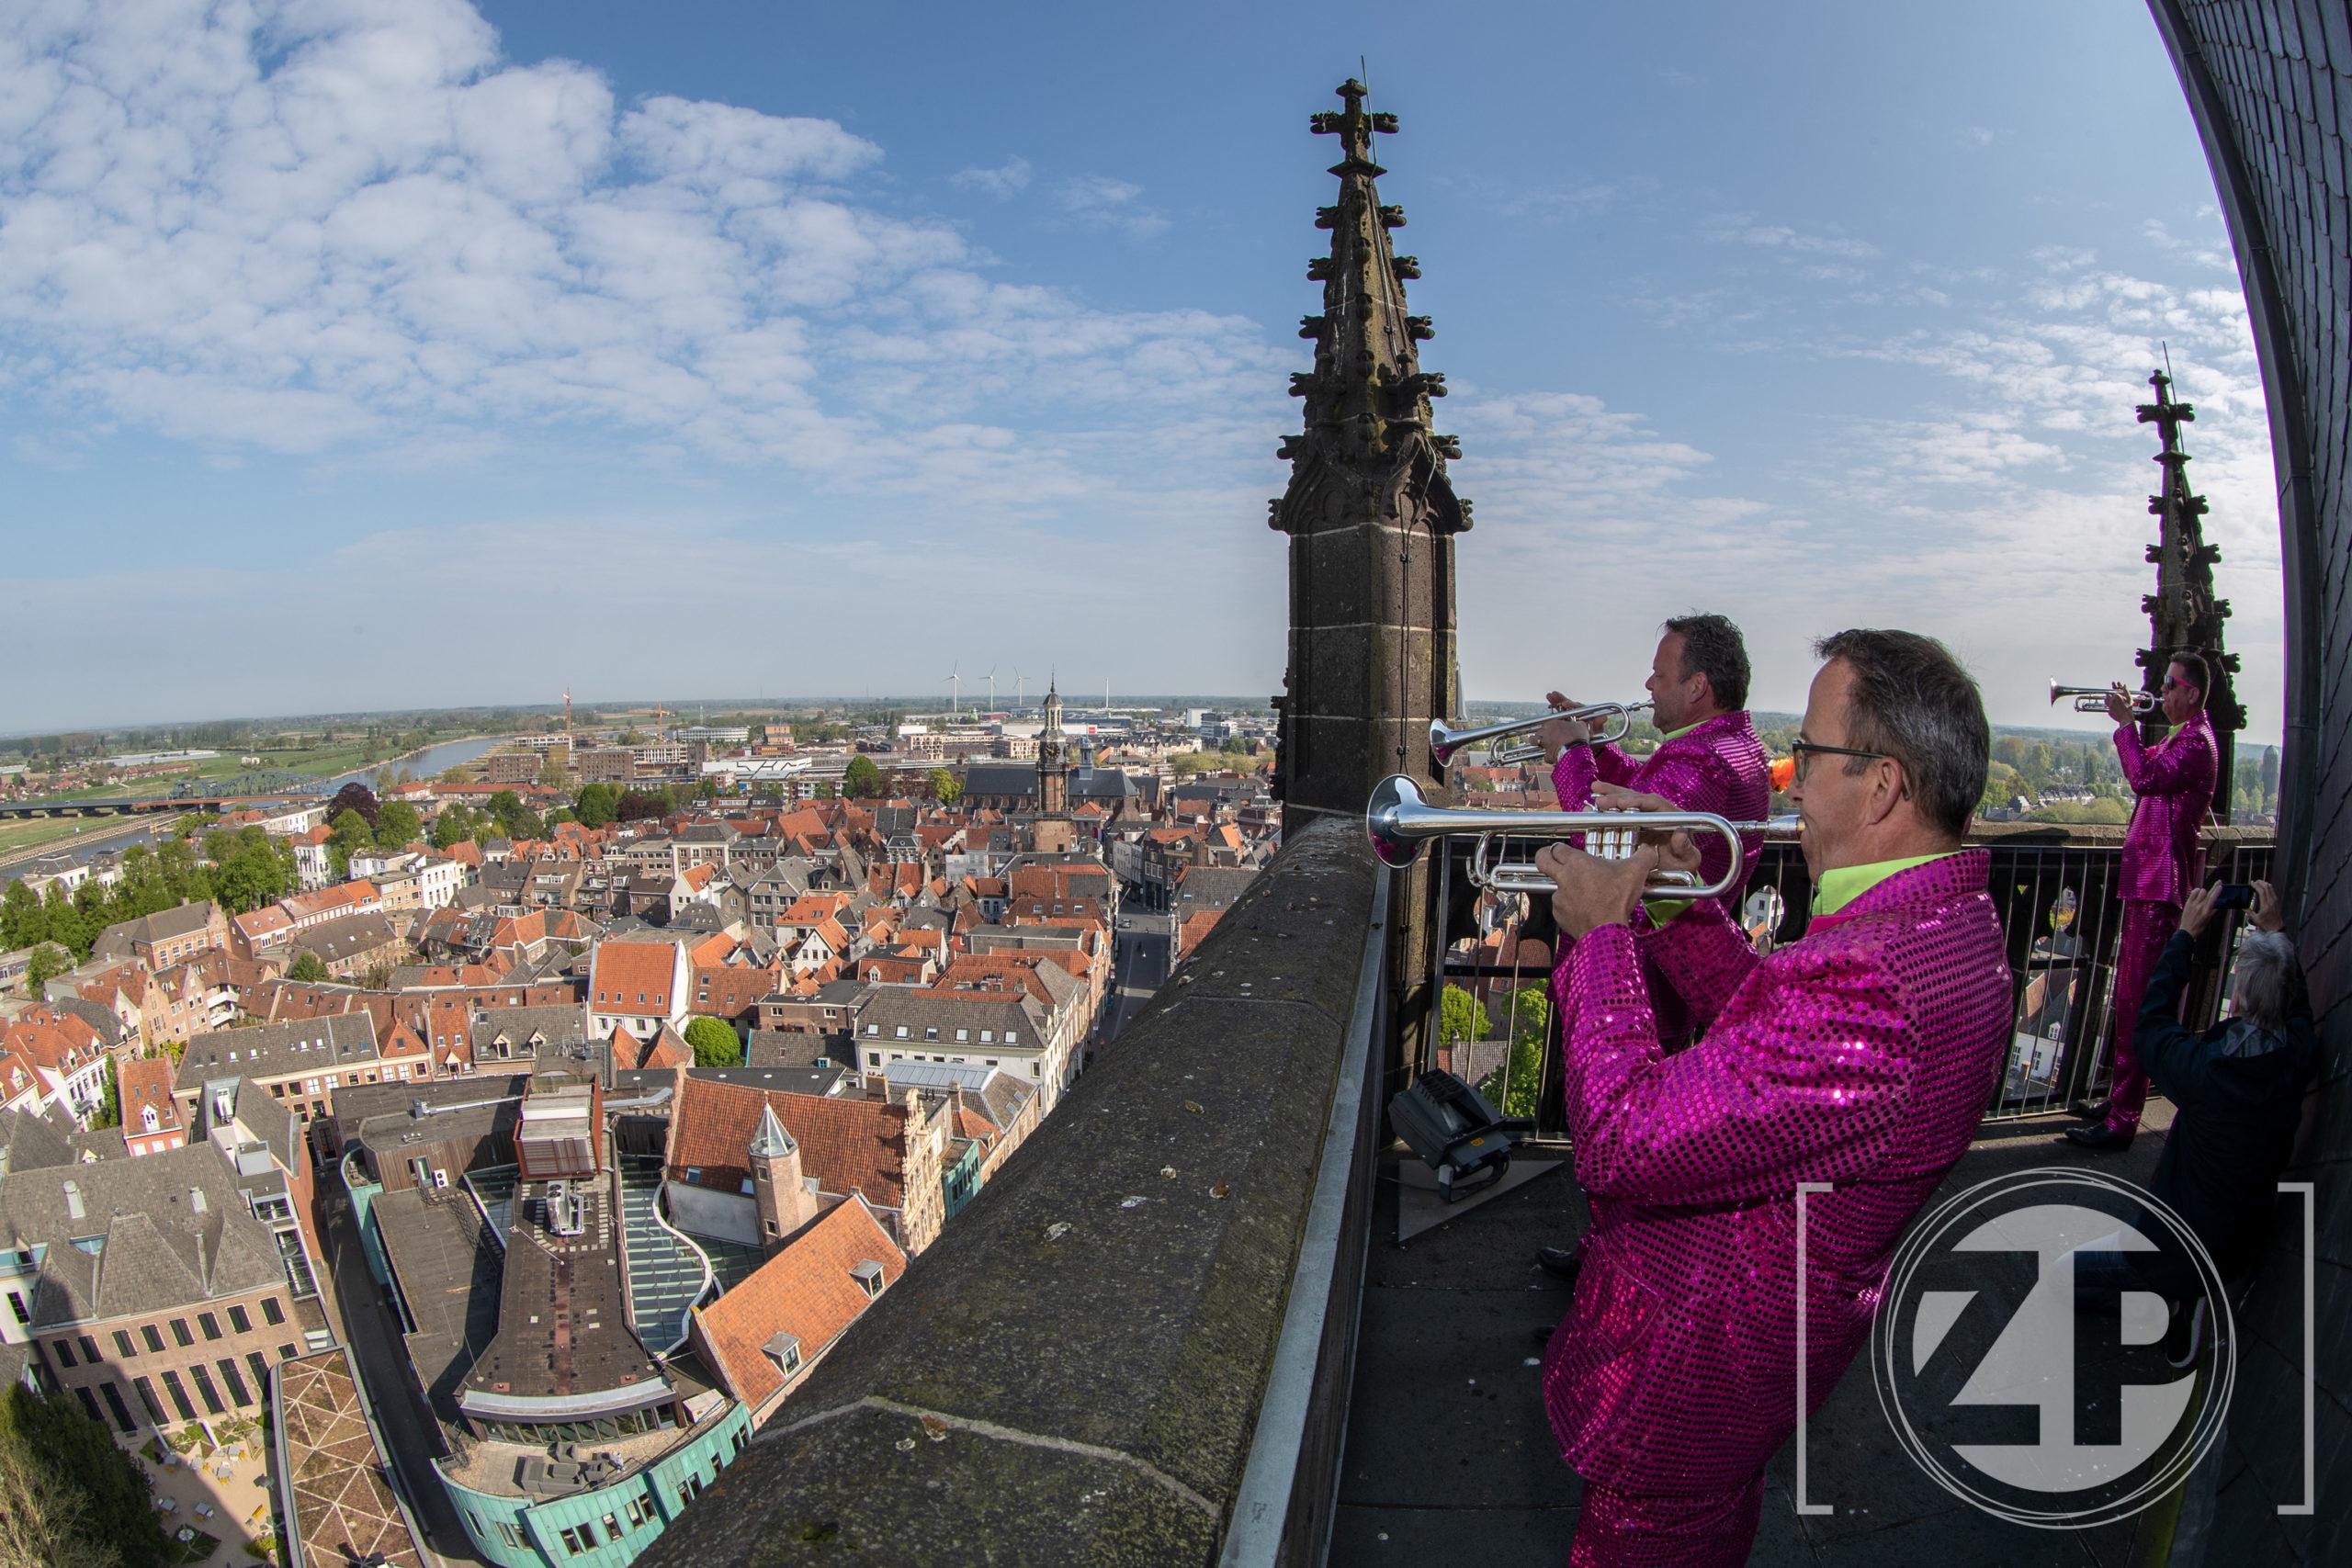 Koningsdag 2020. 4 leden van Dweilorkest 't Spult speelt precies om 10 uur Het Wilhemus vanaf de Zutphense Walburgistoren.